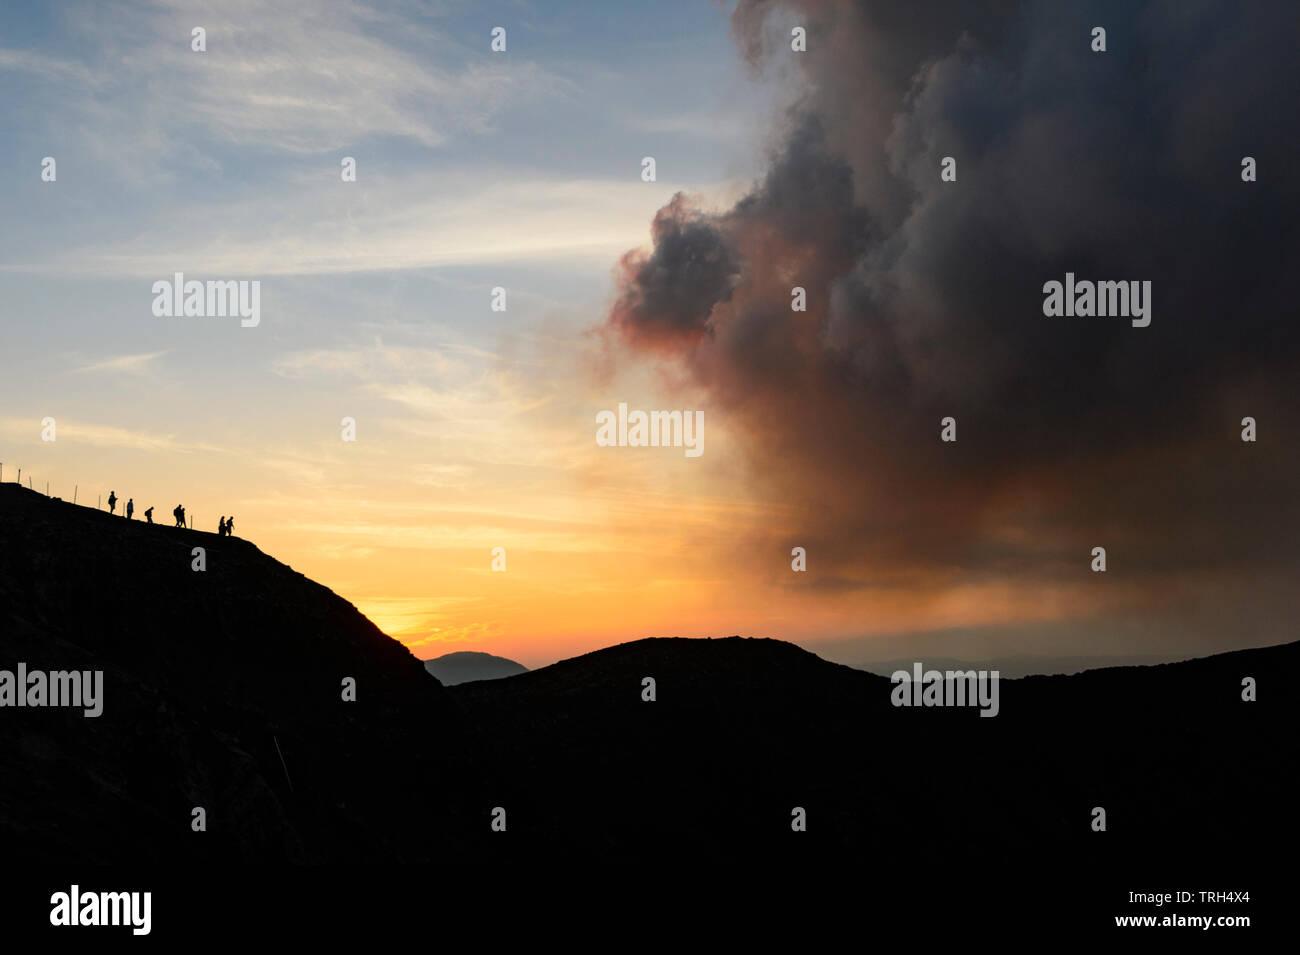 Silhouettes of tourists walking along the crater rim path, Mt Yasur Volcano at sunset, Tanna Island, Vanuatu - Stock Image